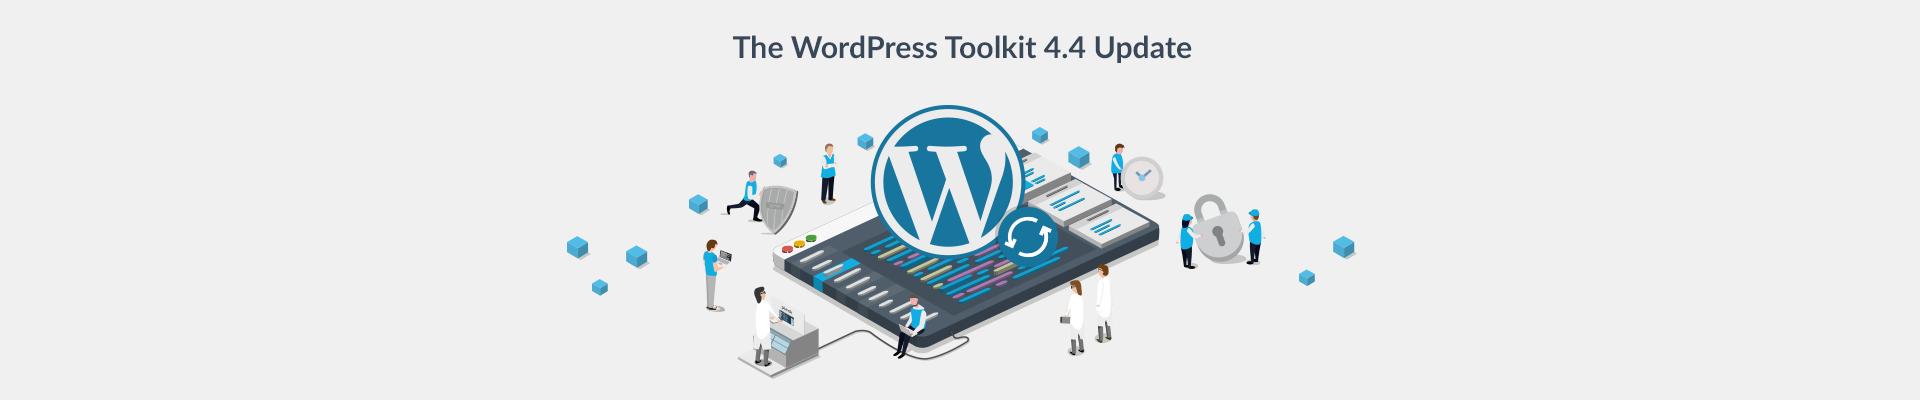 WordPress Toolkit 4.4 Update - Plesk